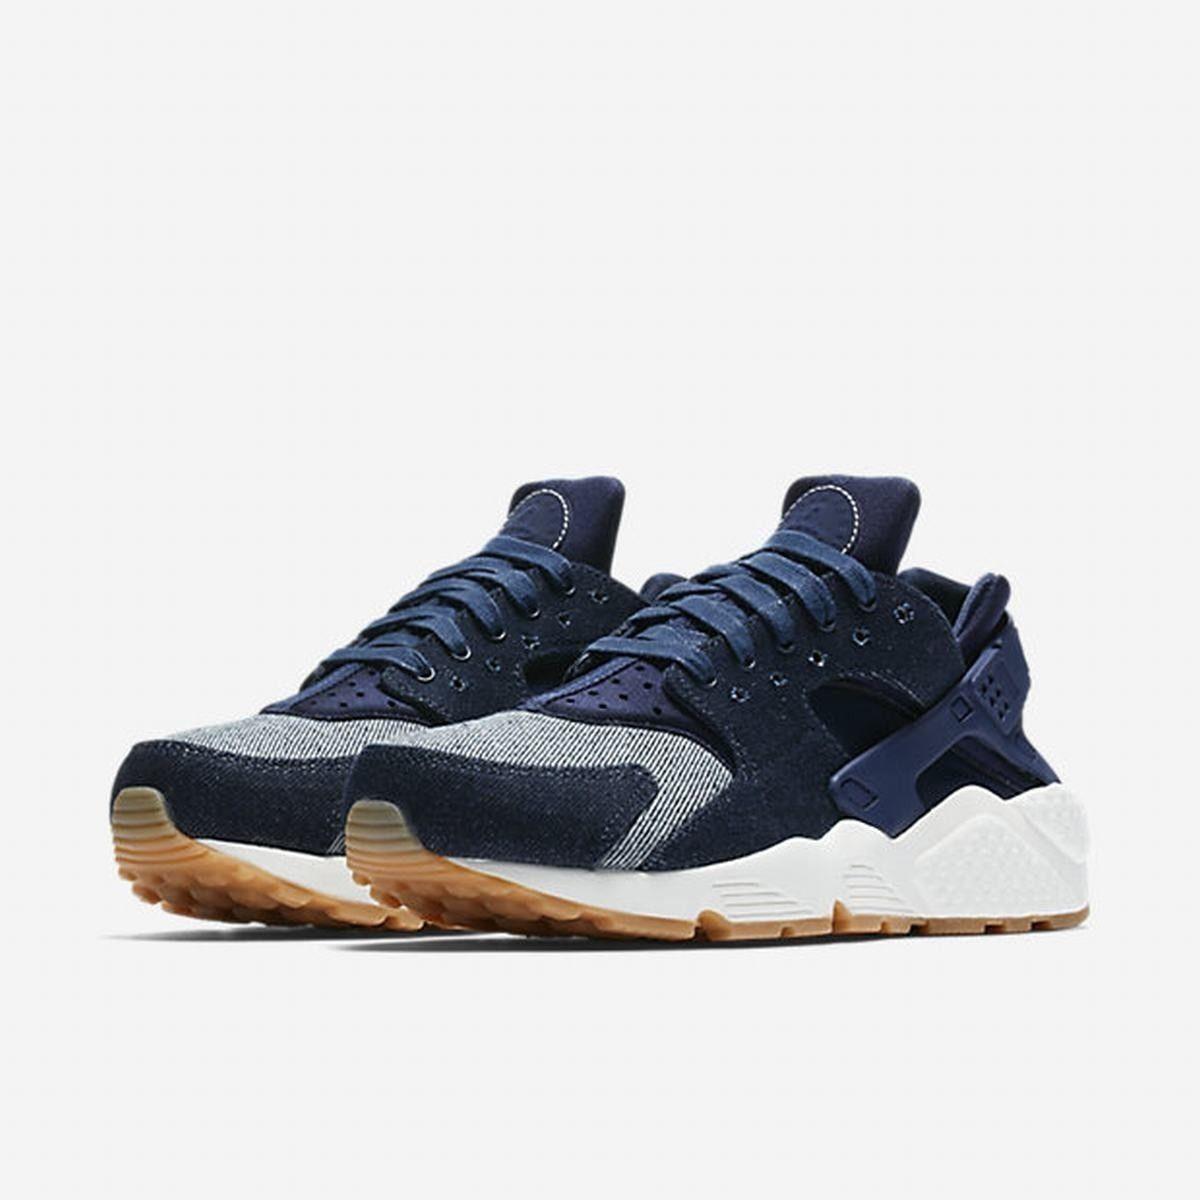 Nike Air Huarache Huarache Huarache Run SE Binary Blue Denim Womens Size 6 Shoes 859429-401  120 6847c0